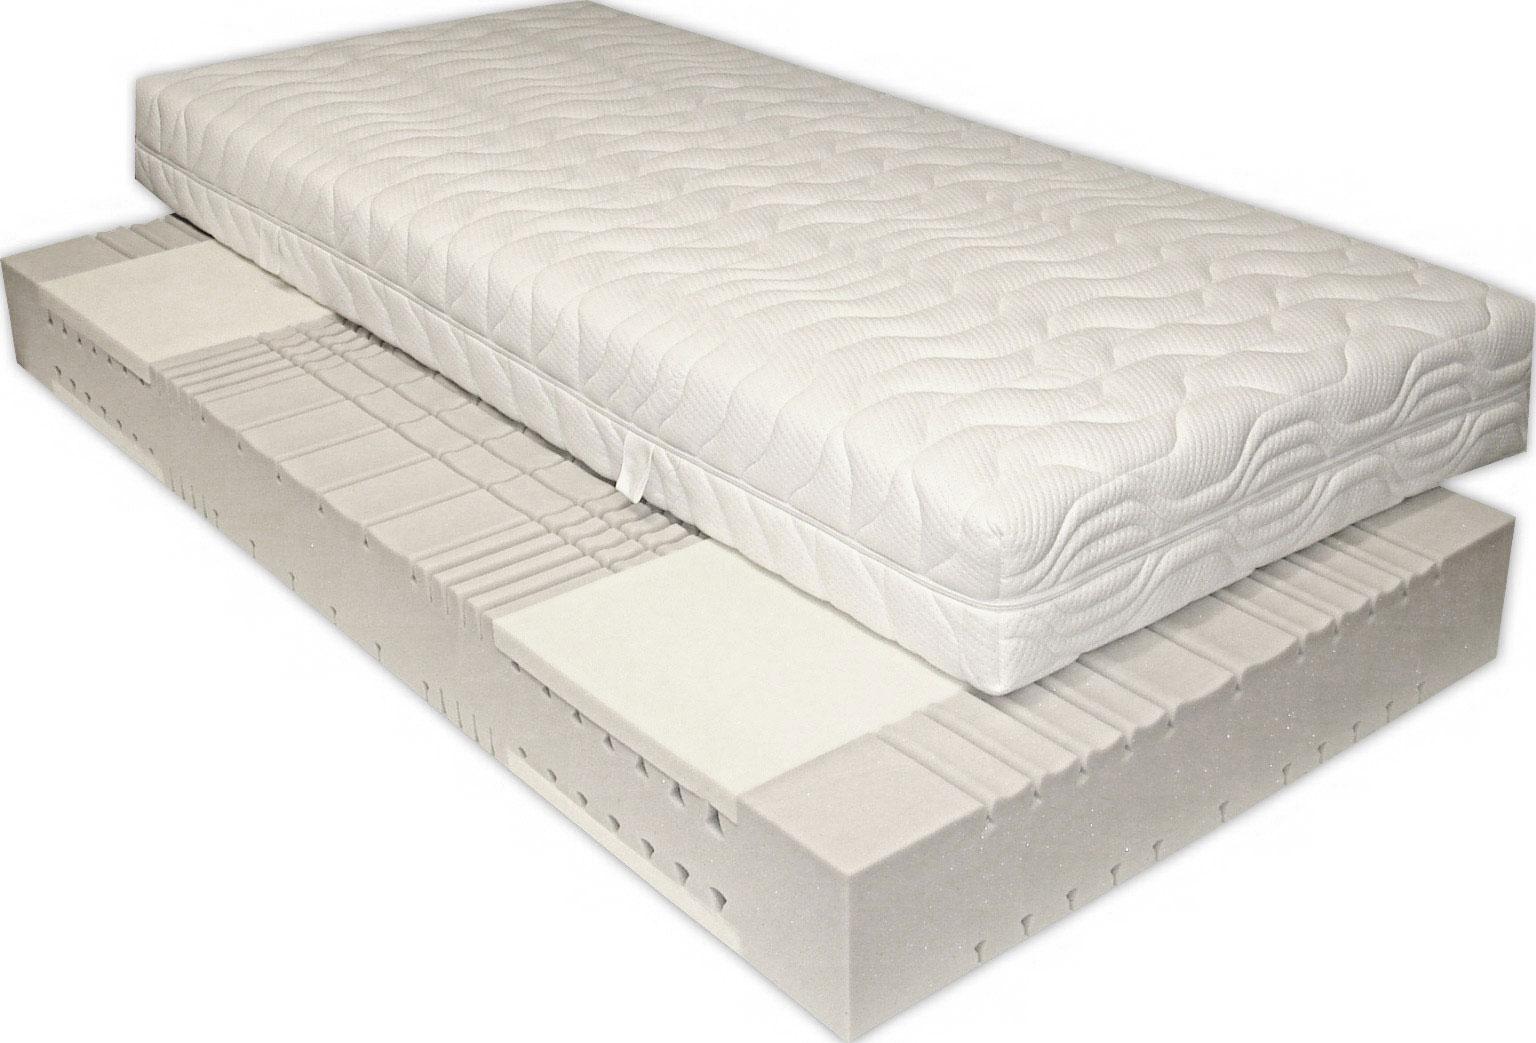 sam 7 zonen kaltschaum h3 visco matratze 160 x 200 cm passion. Black Bedroom Furniture Sets. Home Design Ideas